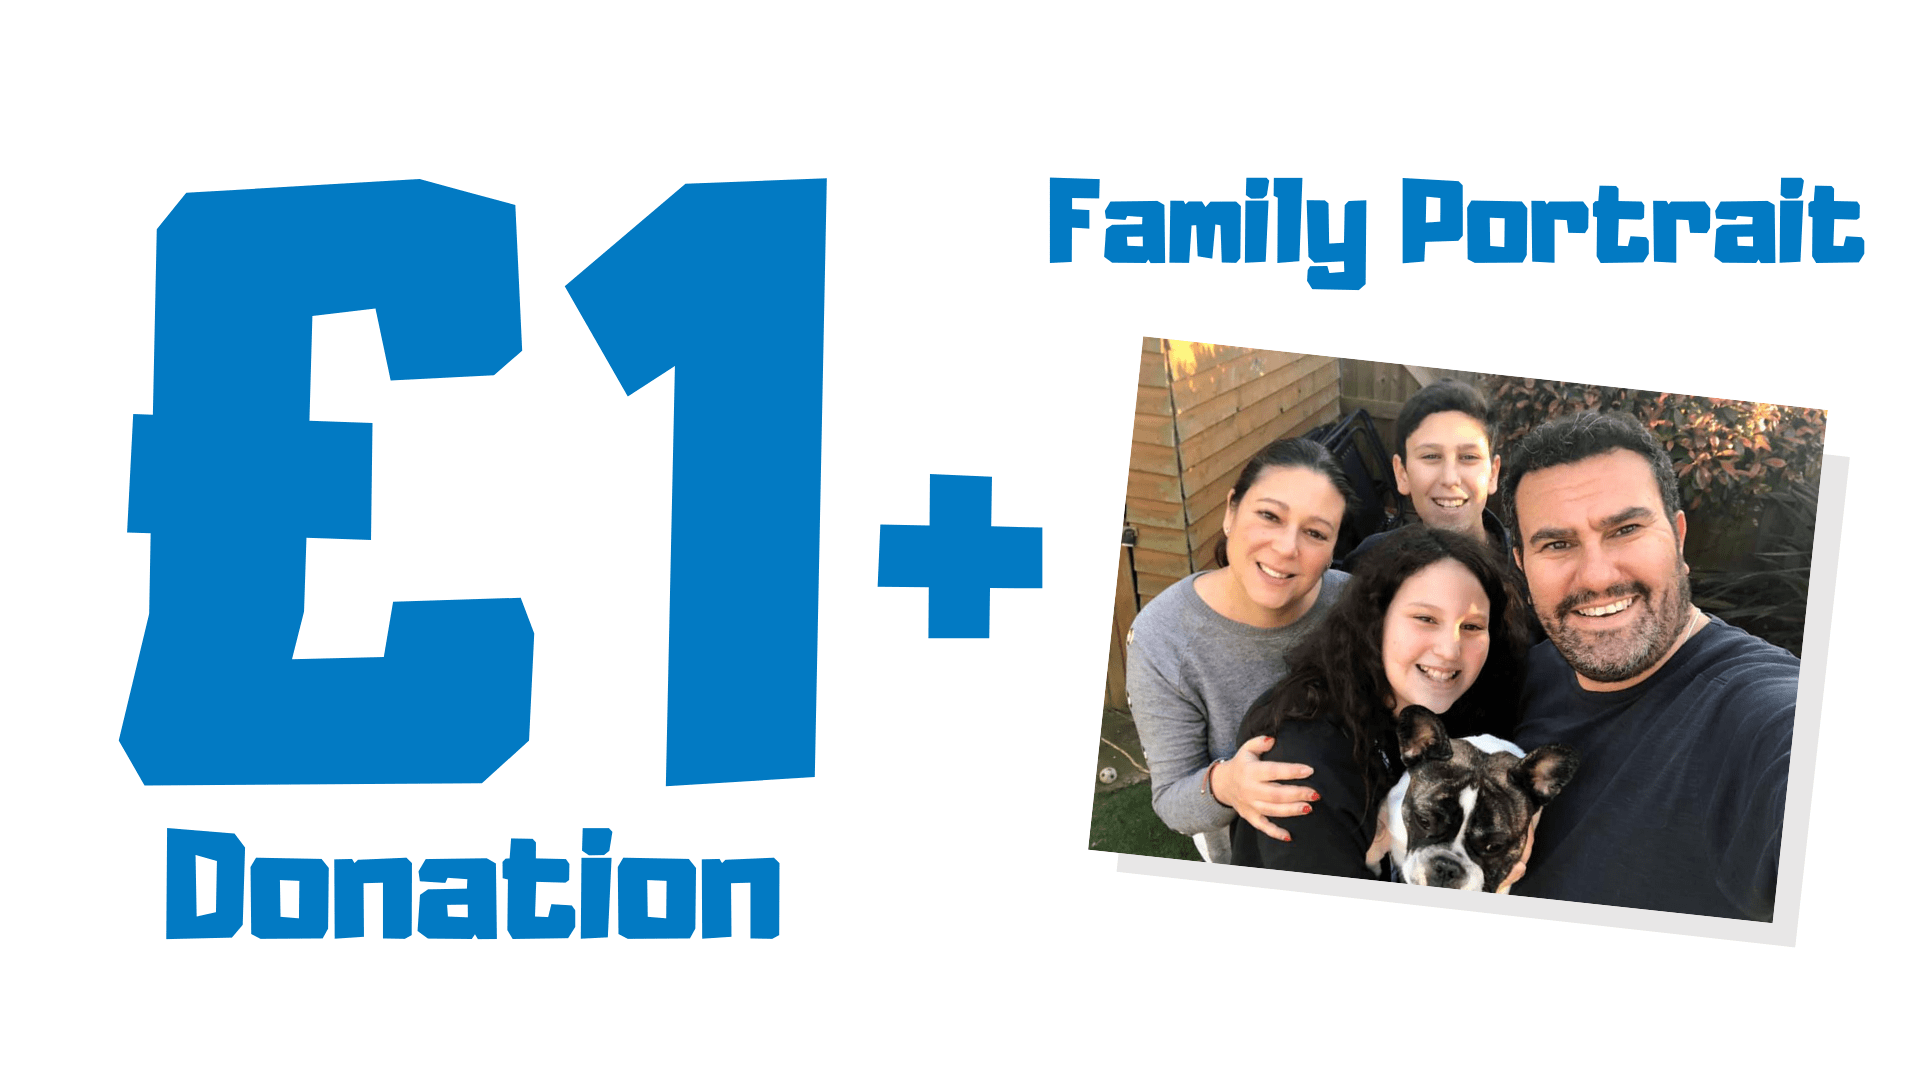 #FamilyPortraitChallenge